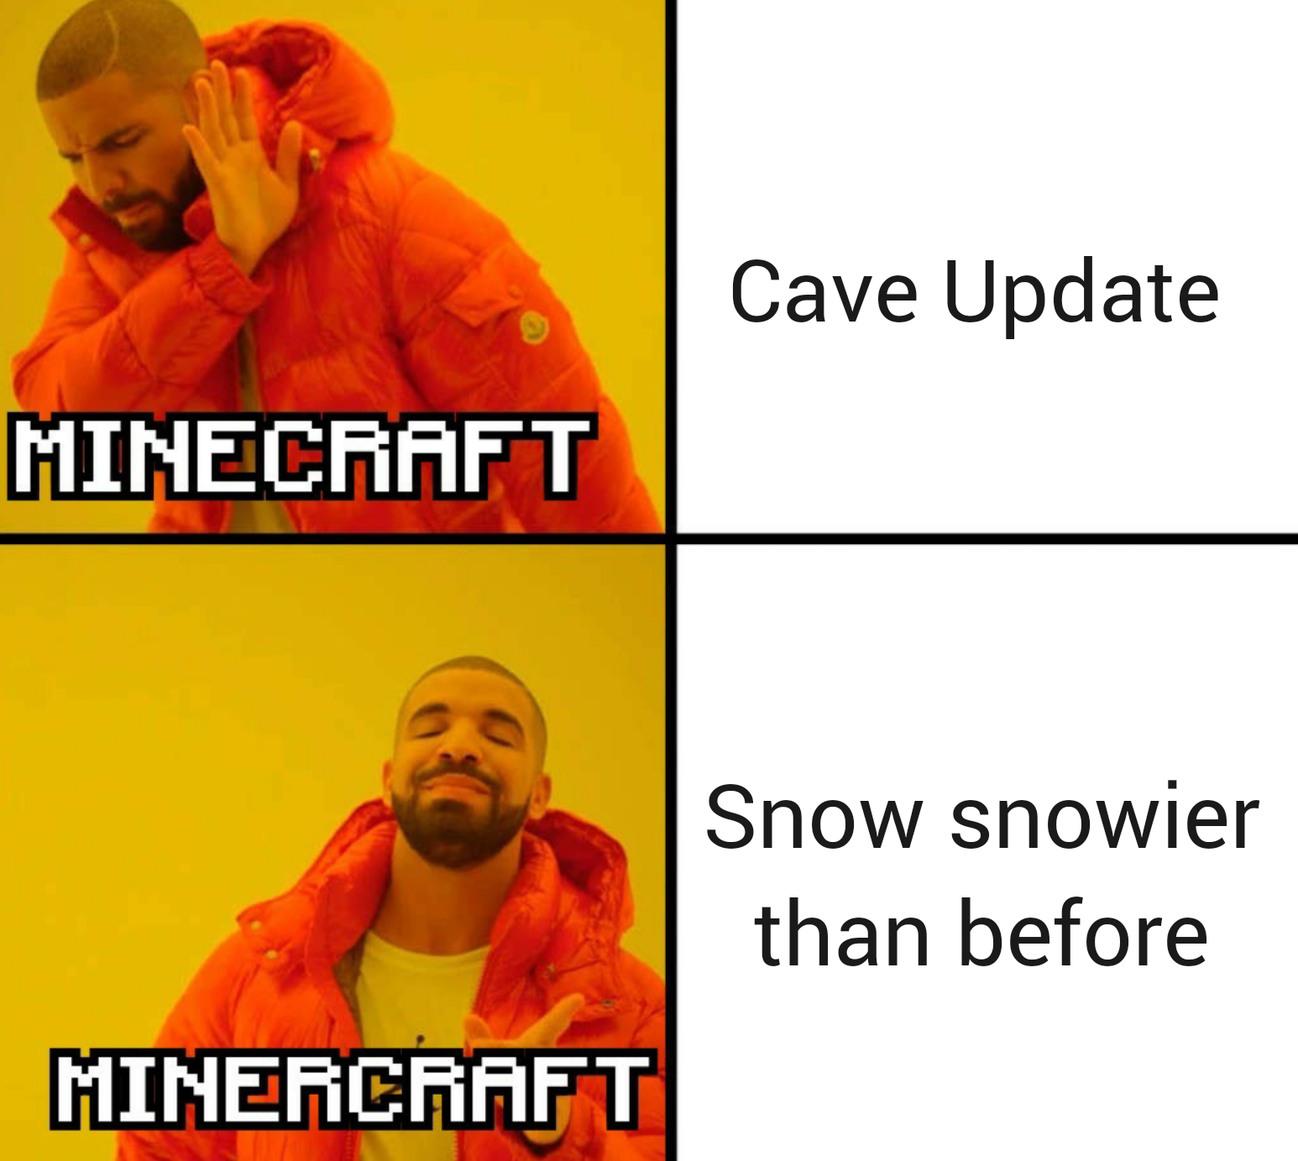 Snow snowier than before - meme